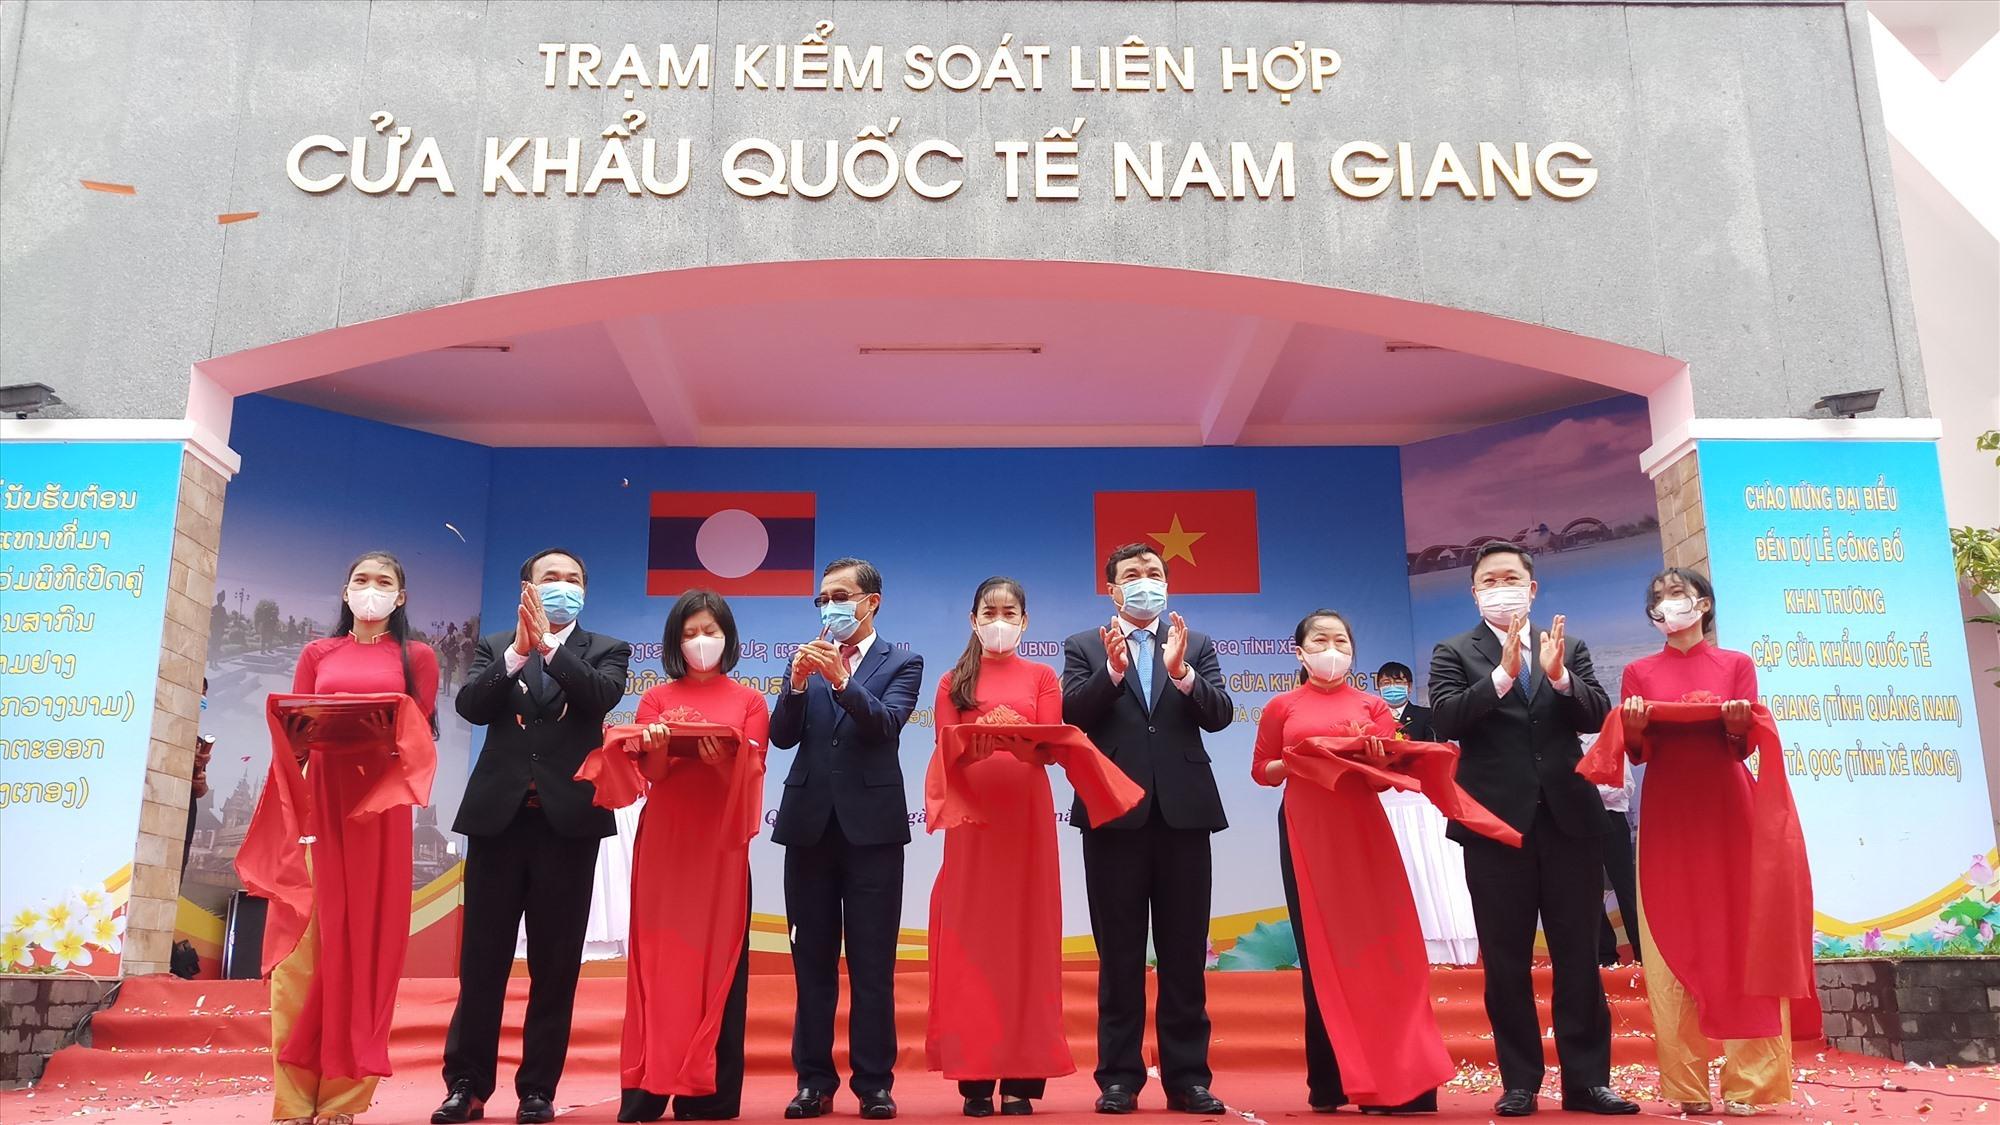 Cutting red ribbon to open the Nam Giang – Dak Ta-Ook international border gate